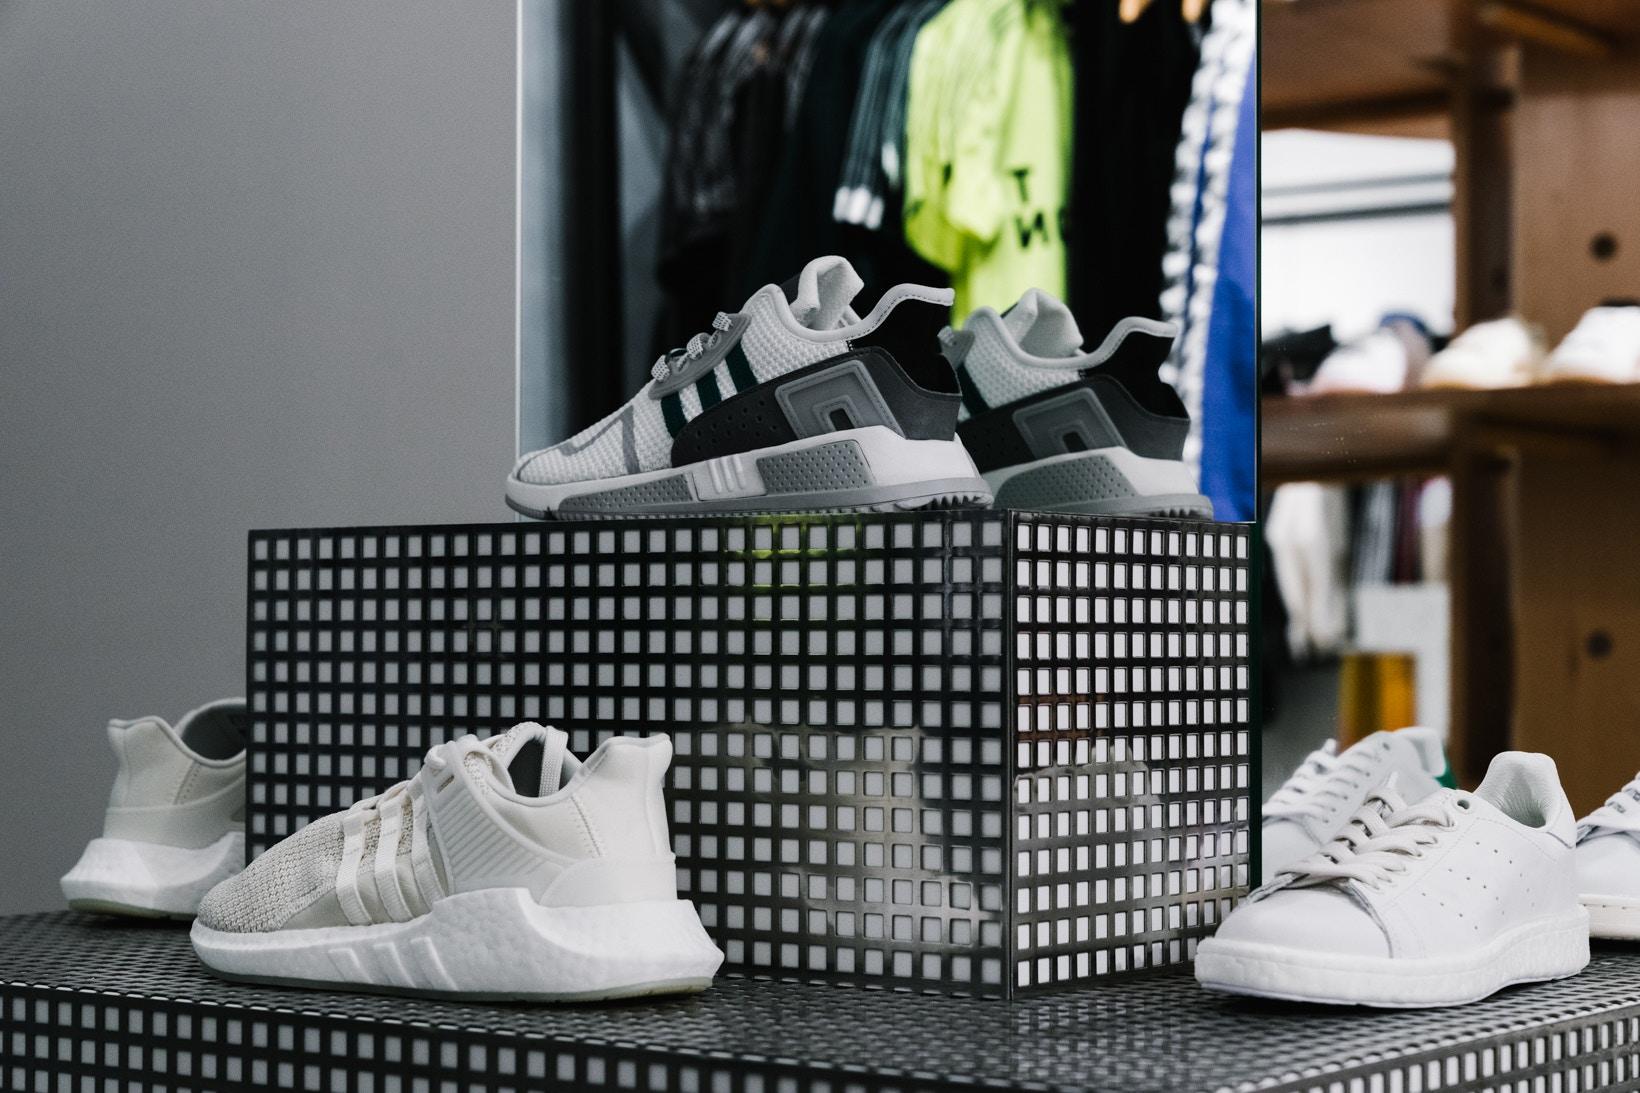 sneakersnstuff-new-york-store-photos-18.jpg